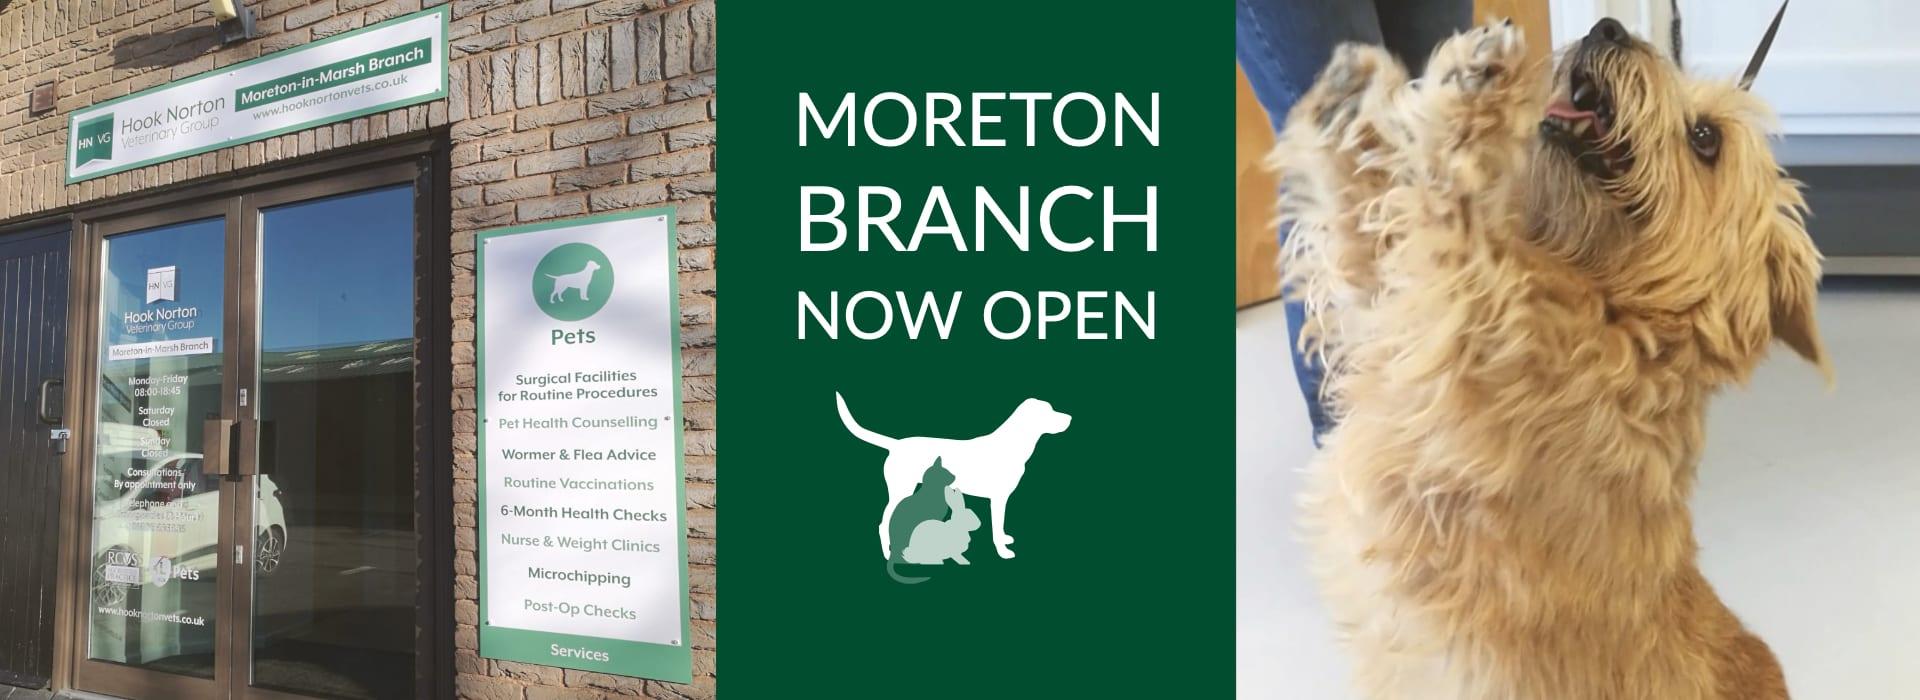 Moreton-in-Marsh Branch - Hook Norton Veterinary Surgeons